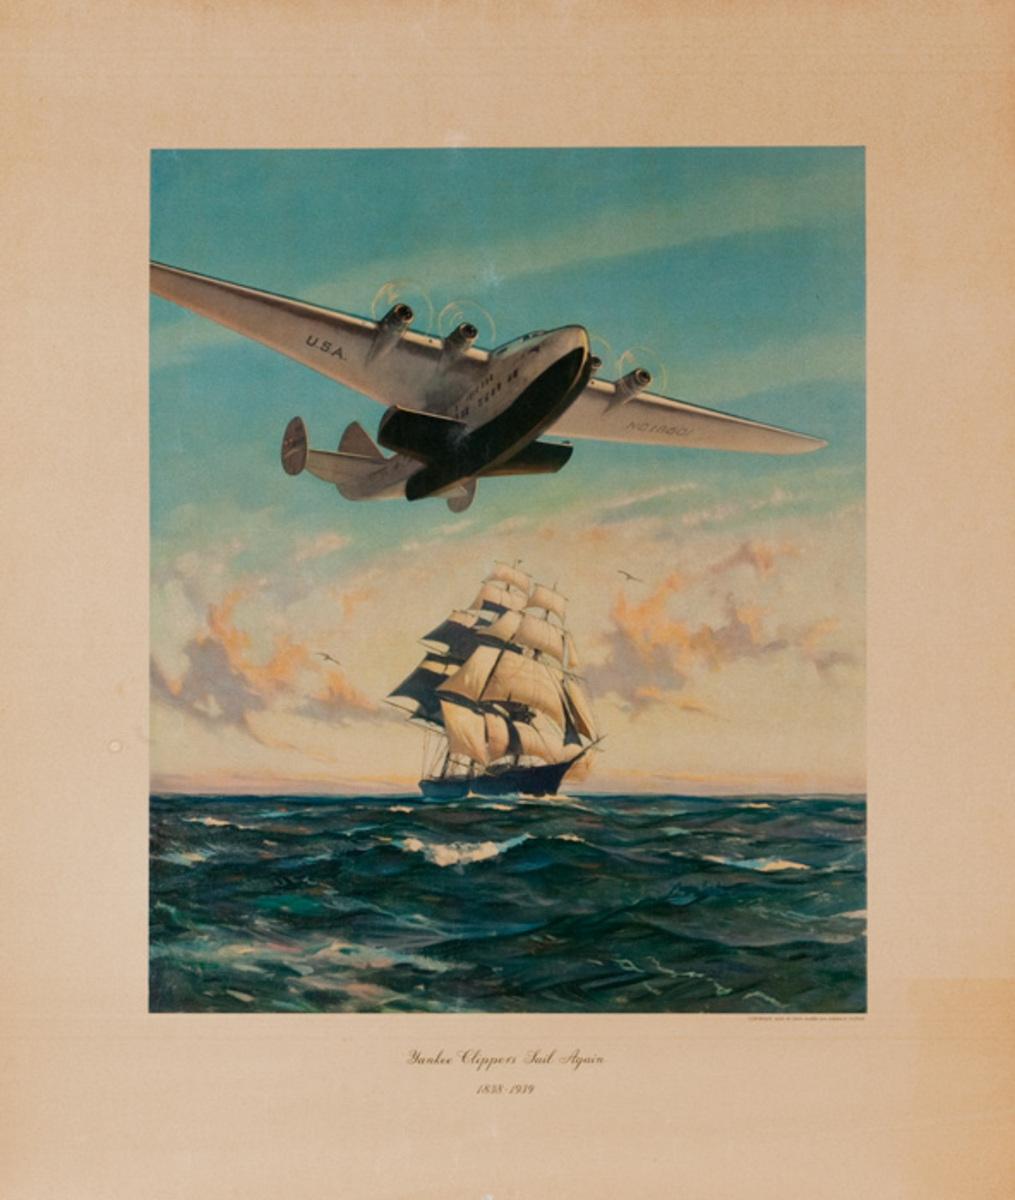 Original Pan Am Poster Yankee Clippers Sail Again 1838-1939